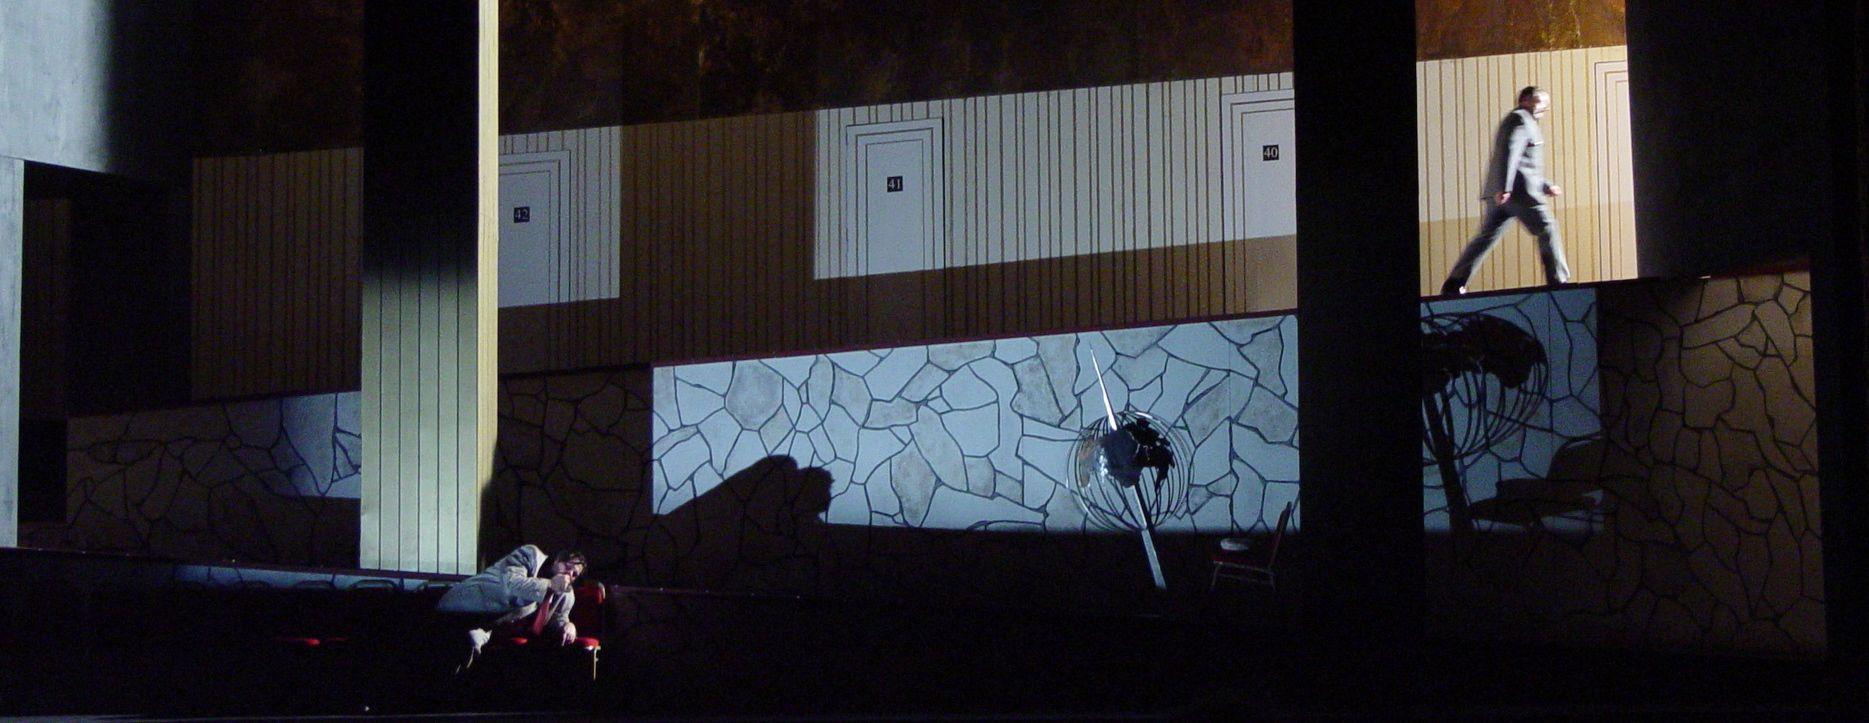 Boris Godunov | New Zealand Opera | Directed by Matthew Richardson | Designed by Giles Cadle (Photograph by Tony Rabbit)